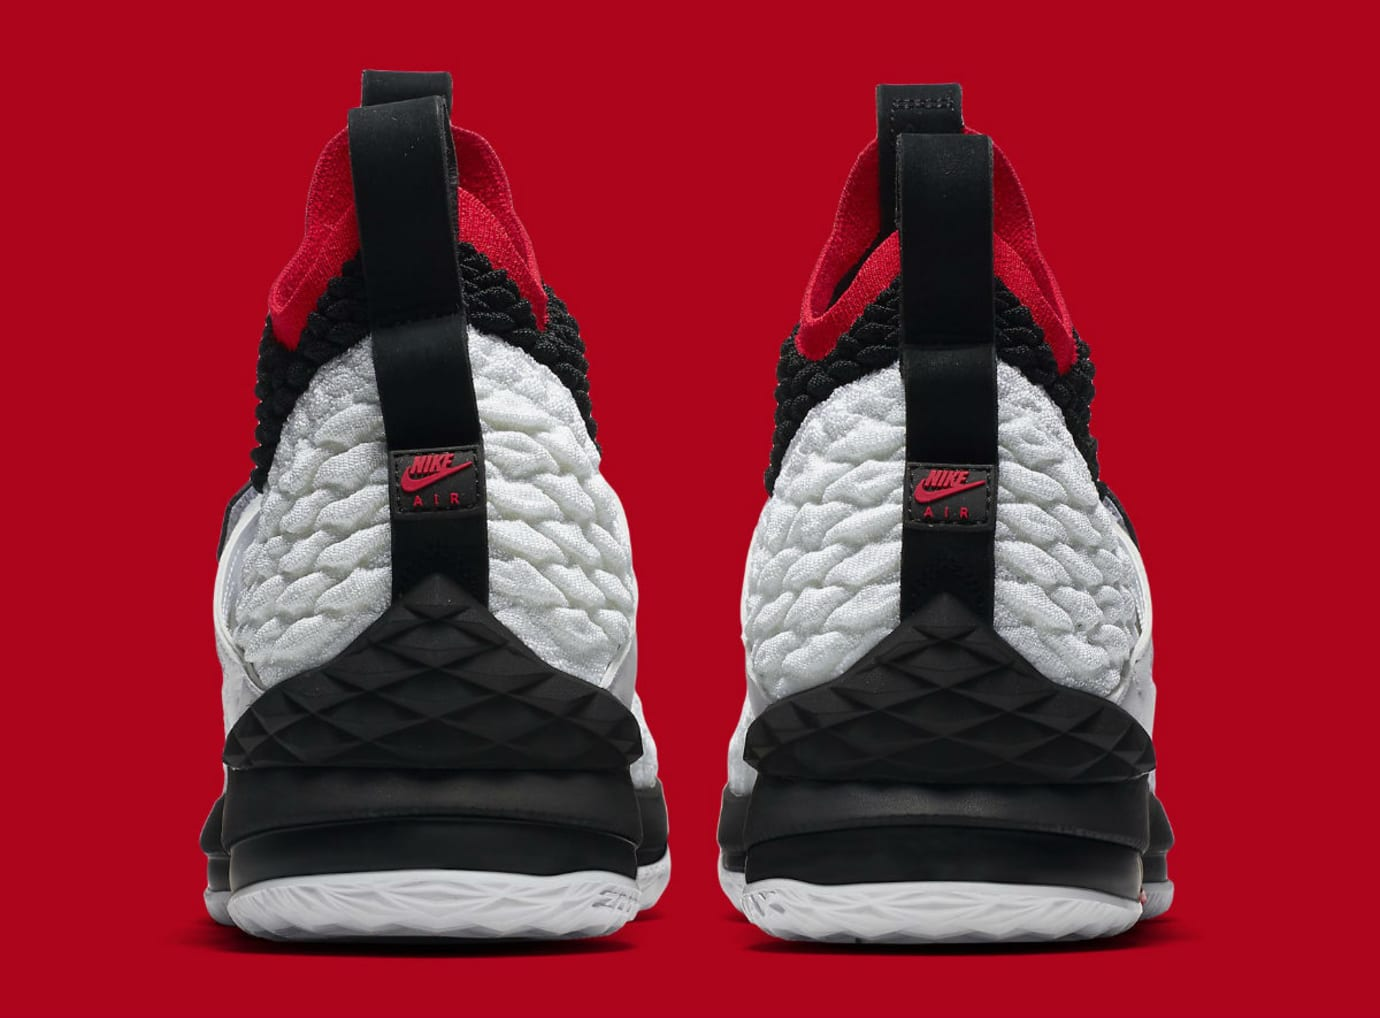 Nike LeBron 15 Diamond Turf Release Date AO9144-100 Heel